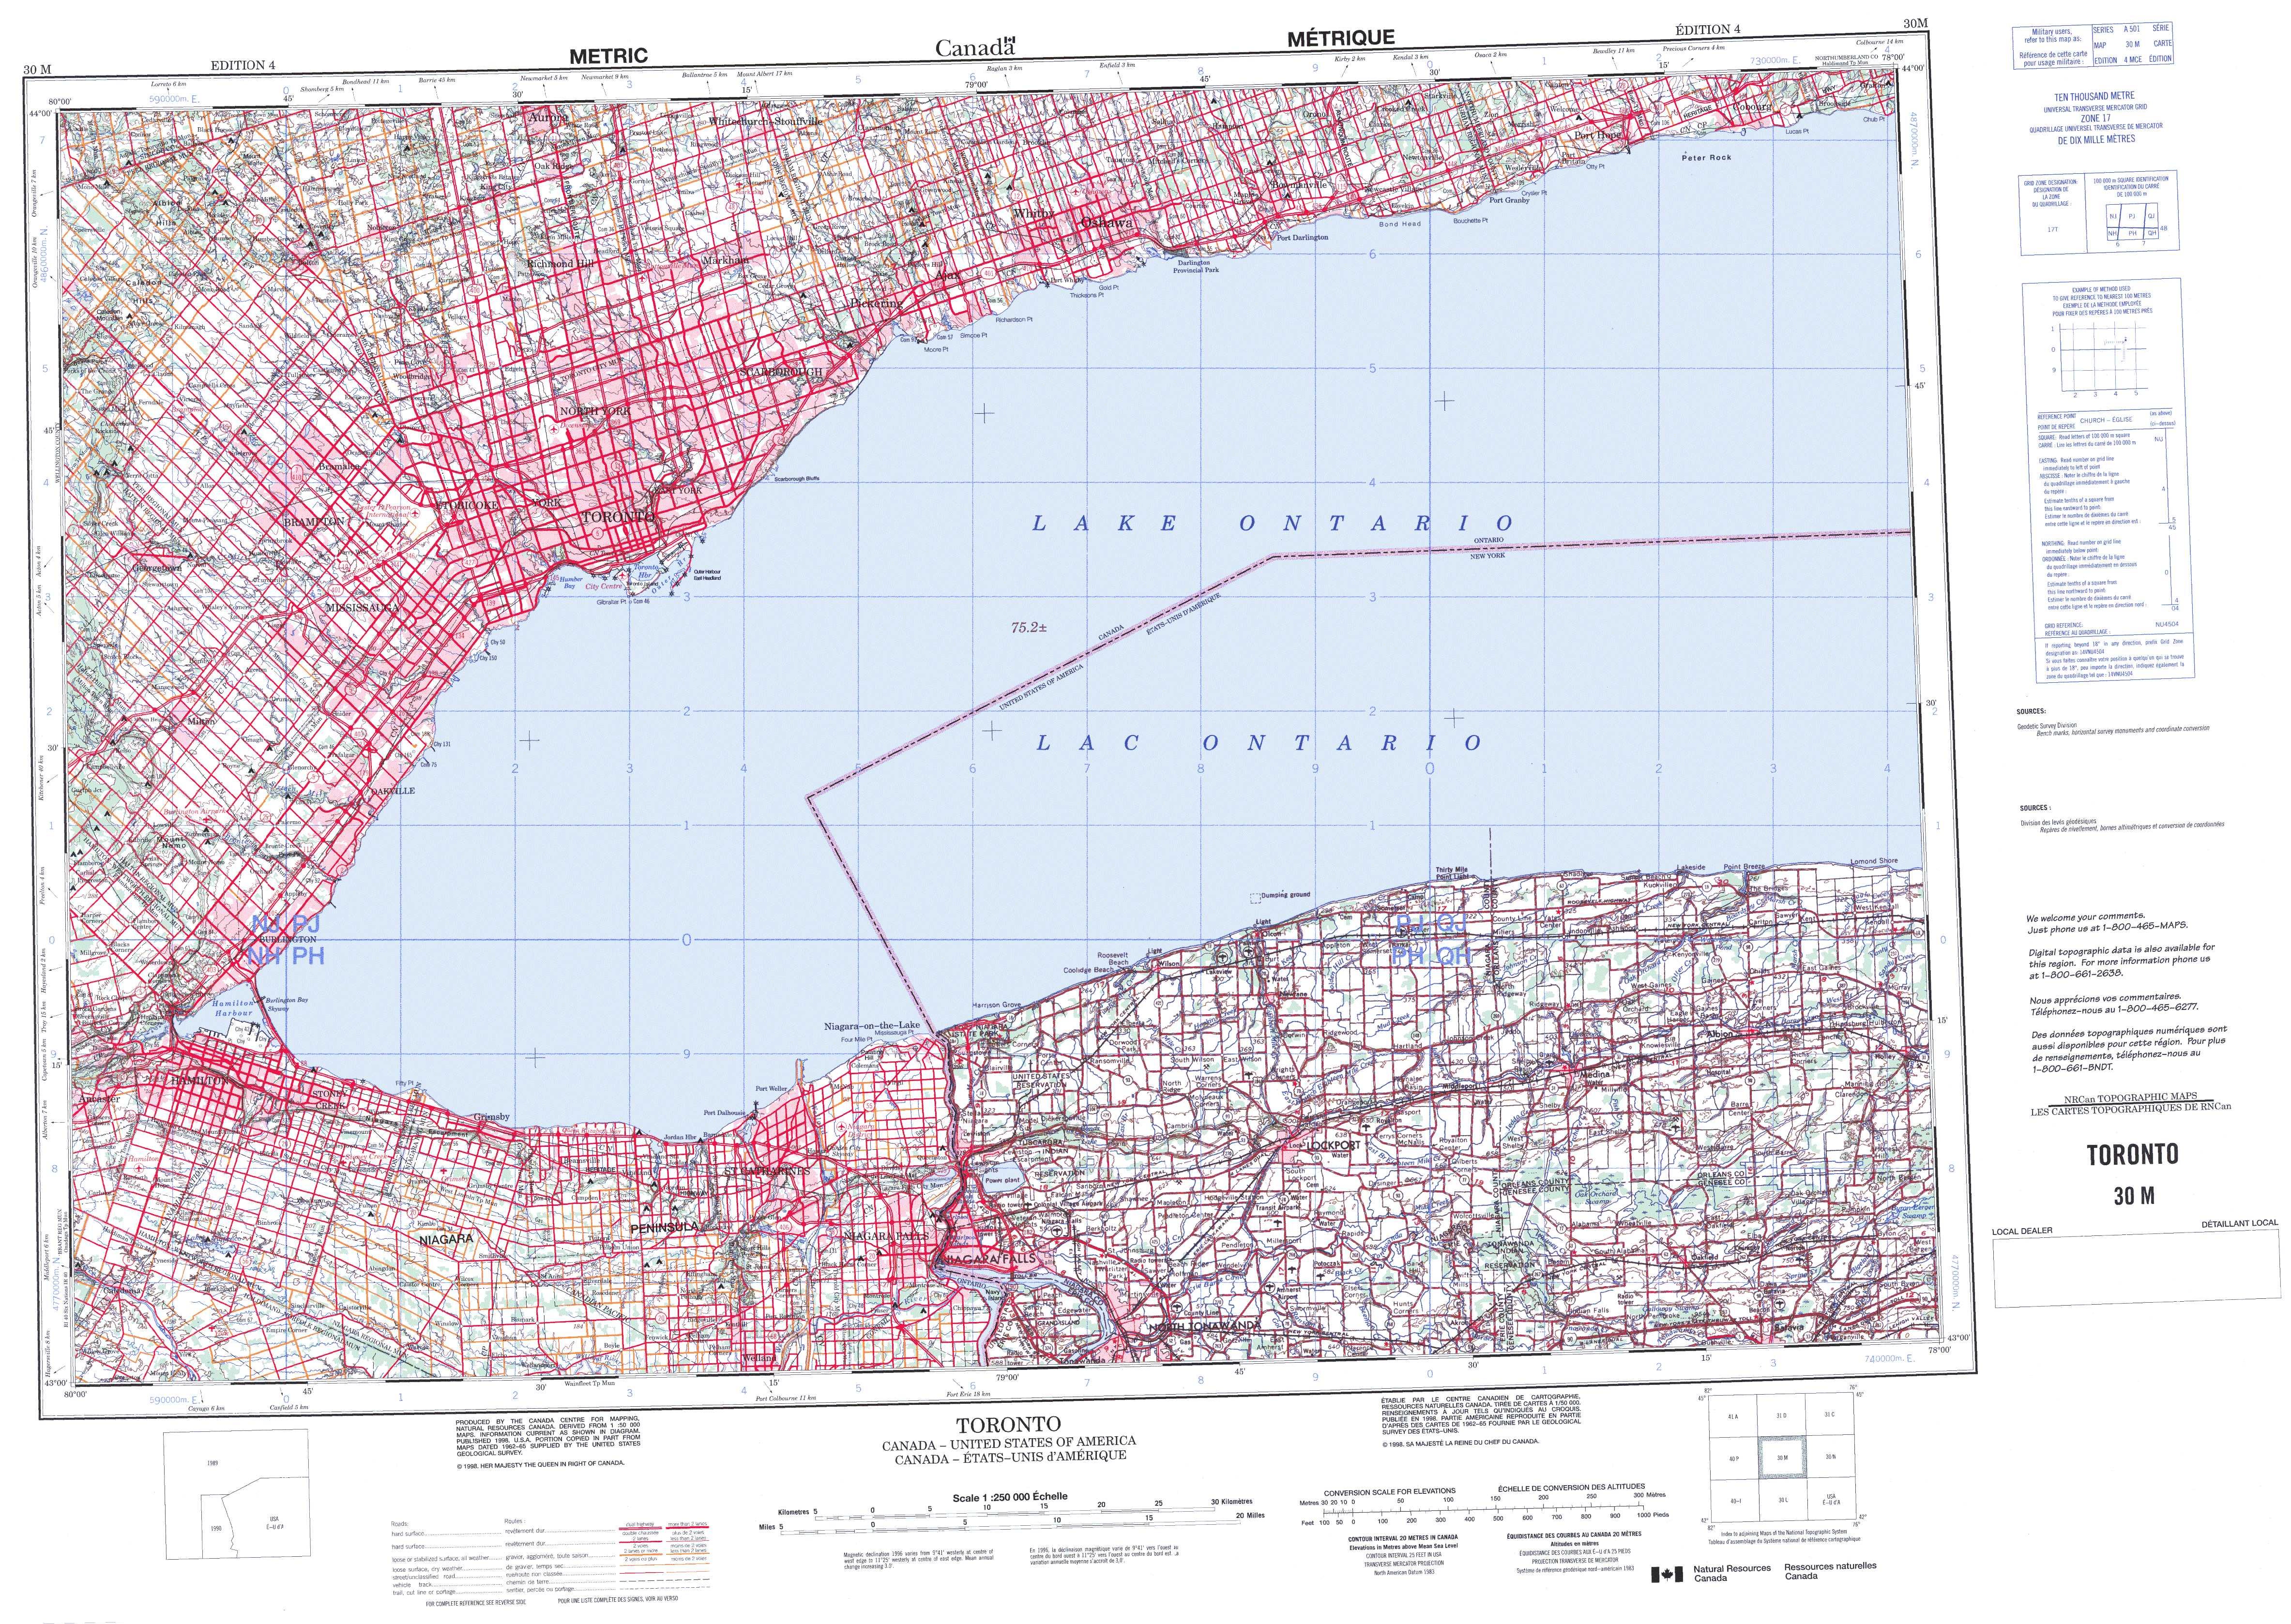 Printable Topographic Map Of Toronto M ON - Print topo maps